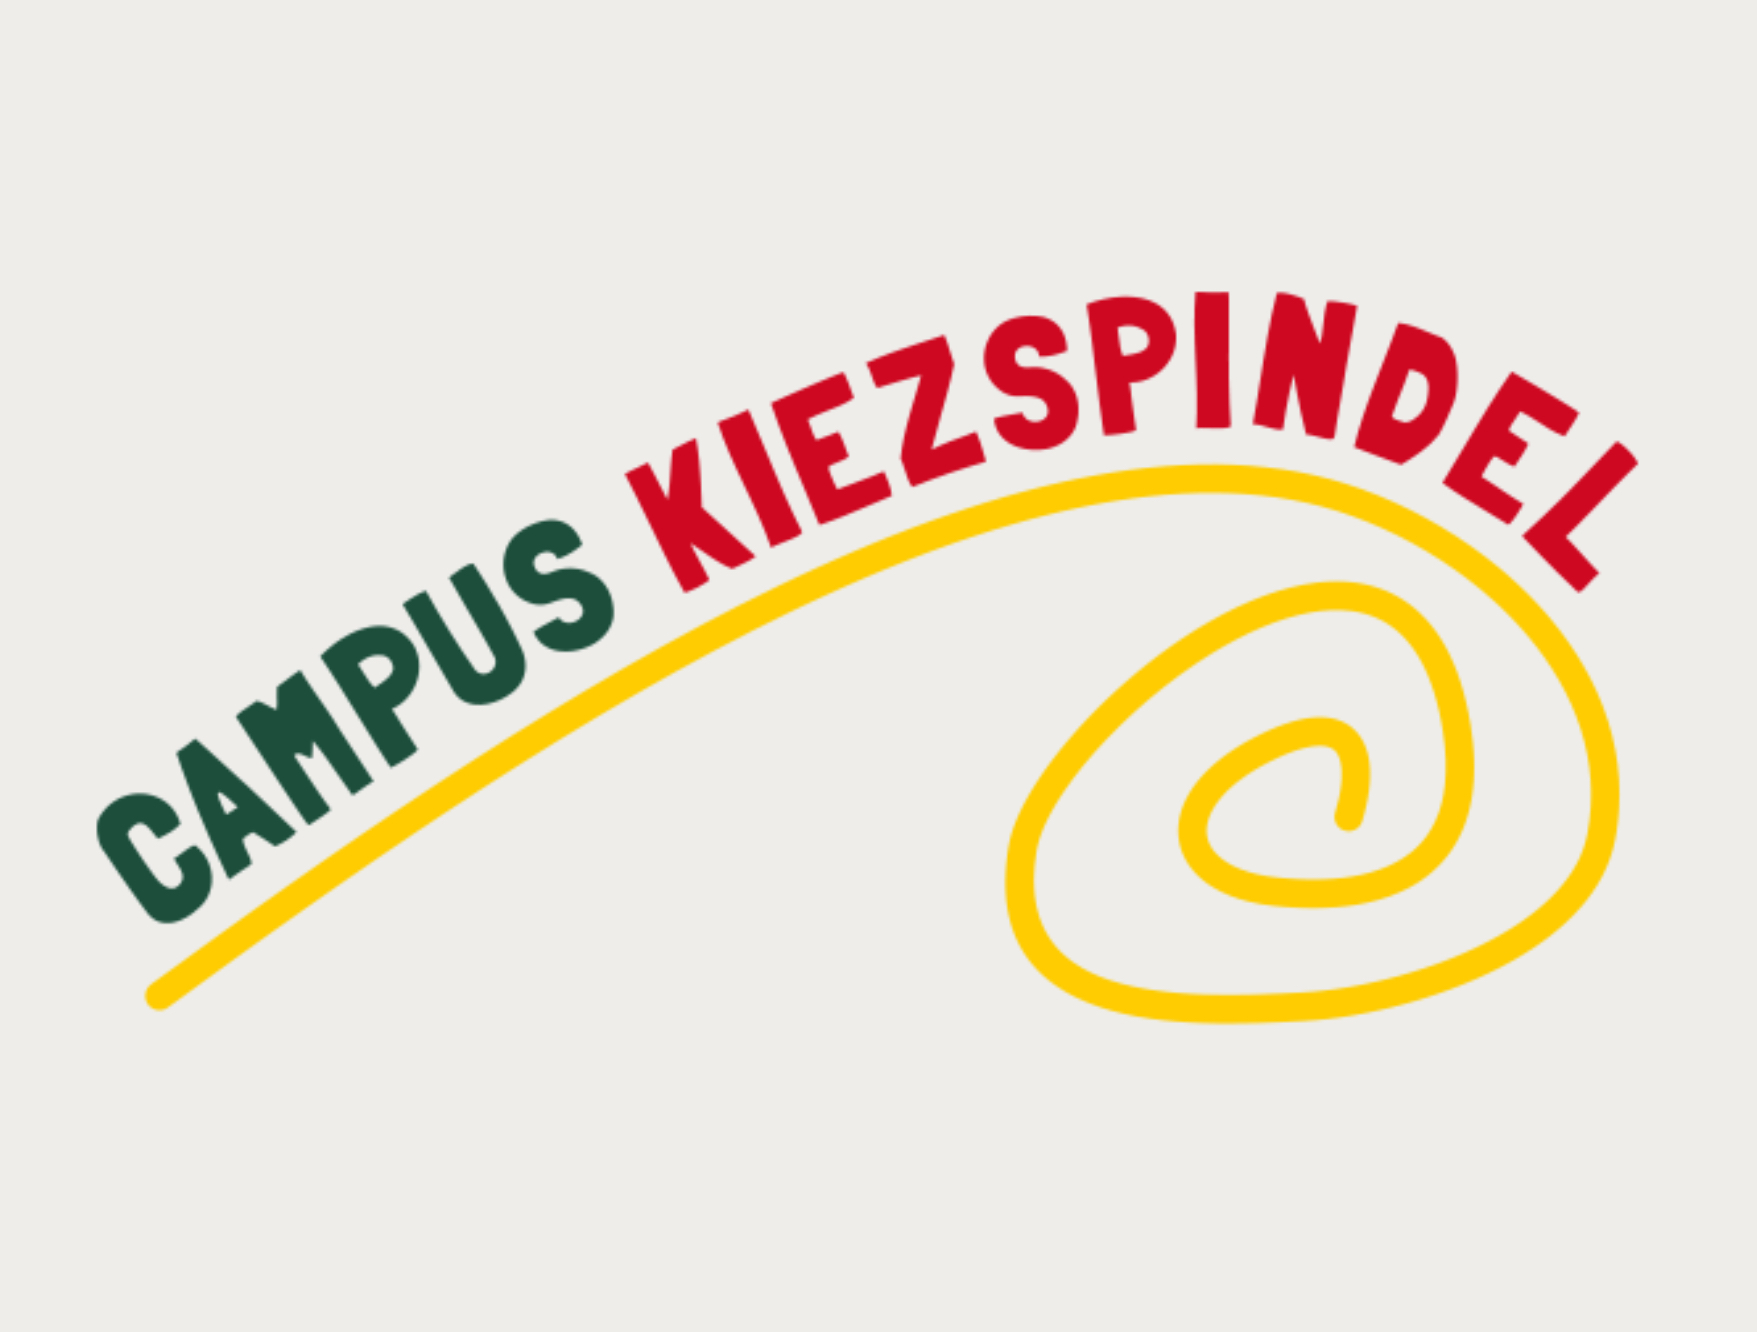 Krabbel & Spielgruppe - Campus Kiezspindel - Berlin Köpenick/Spindlersfeld